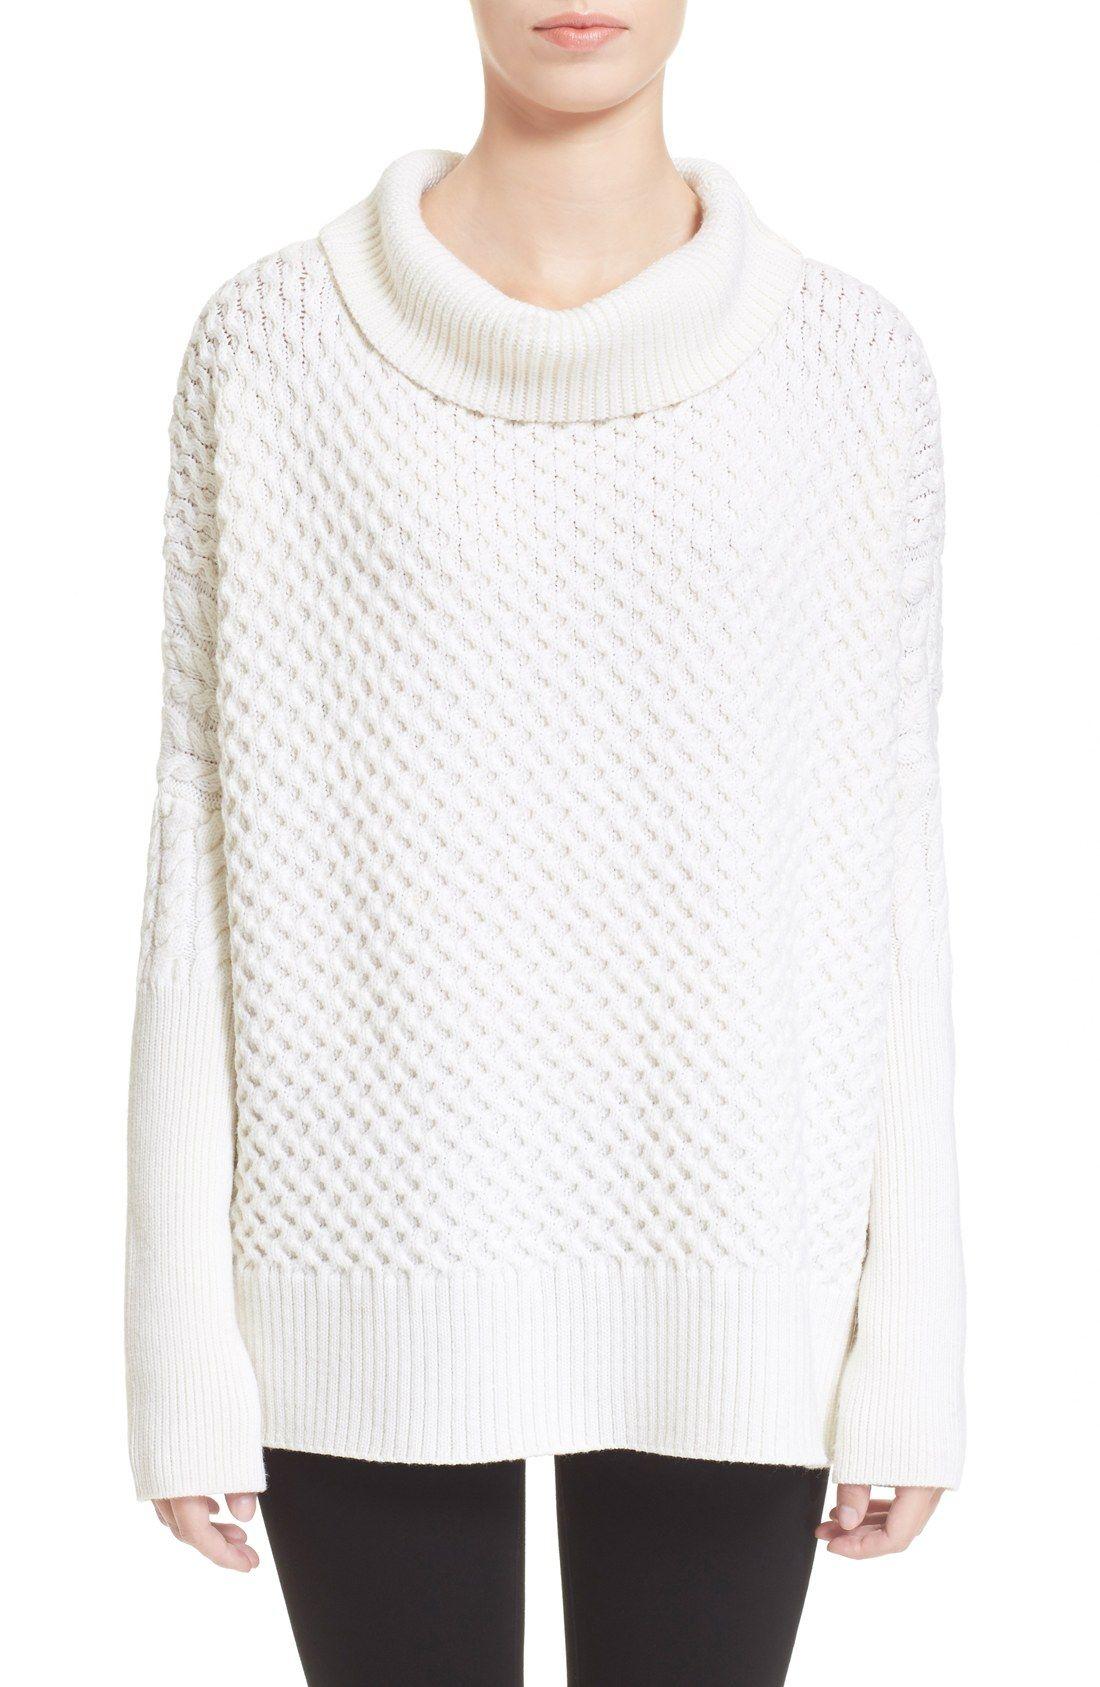 AYR 'Le Square' Merino Wool Cowl Neck Sweater | Wishful Thinking ...